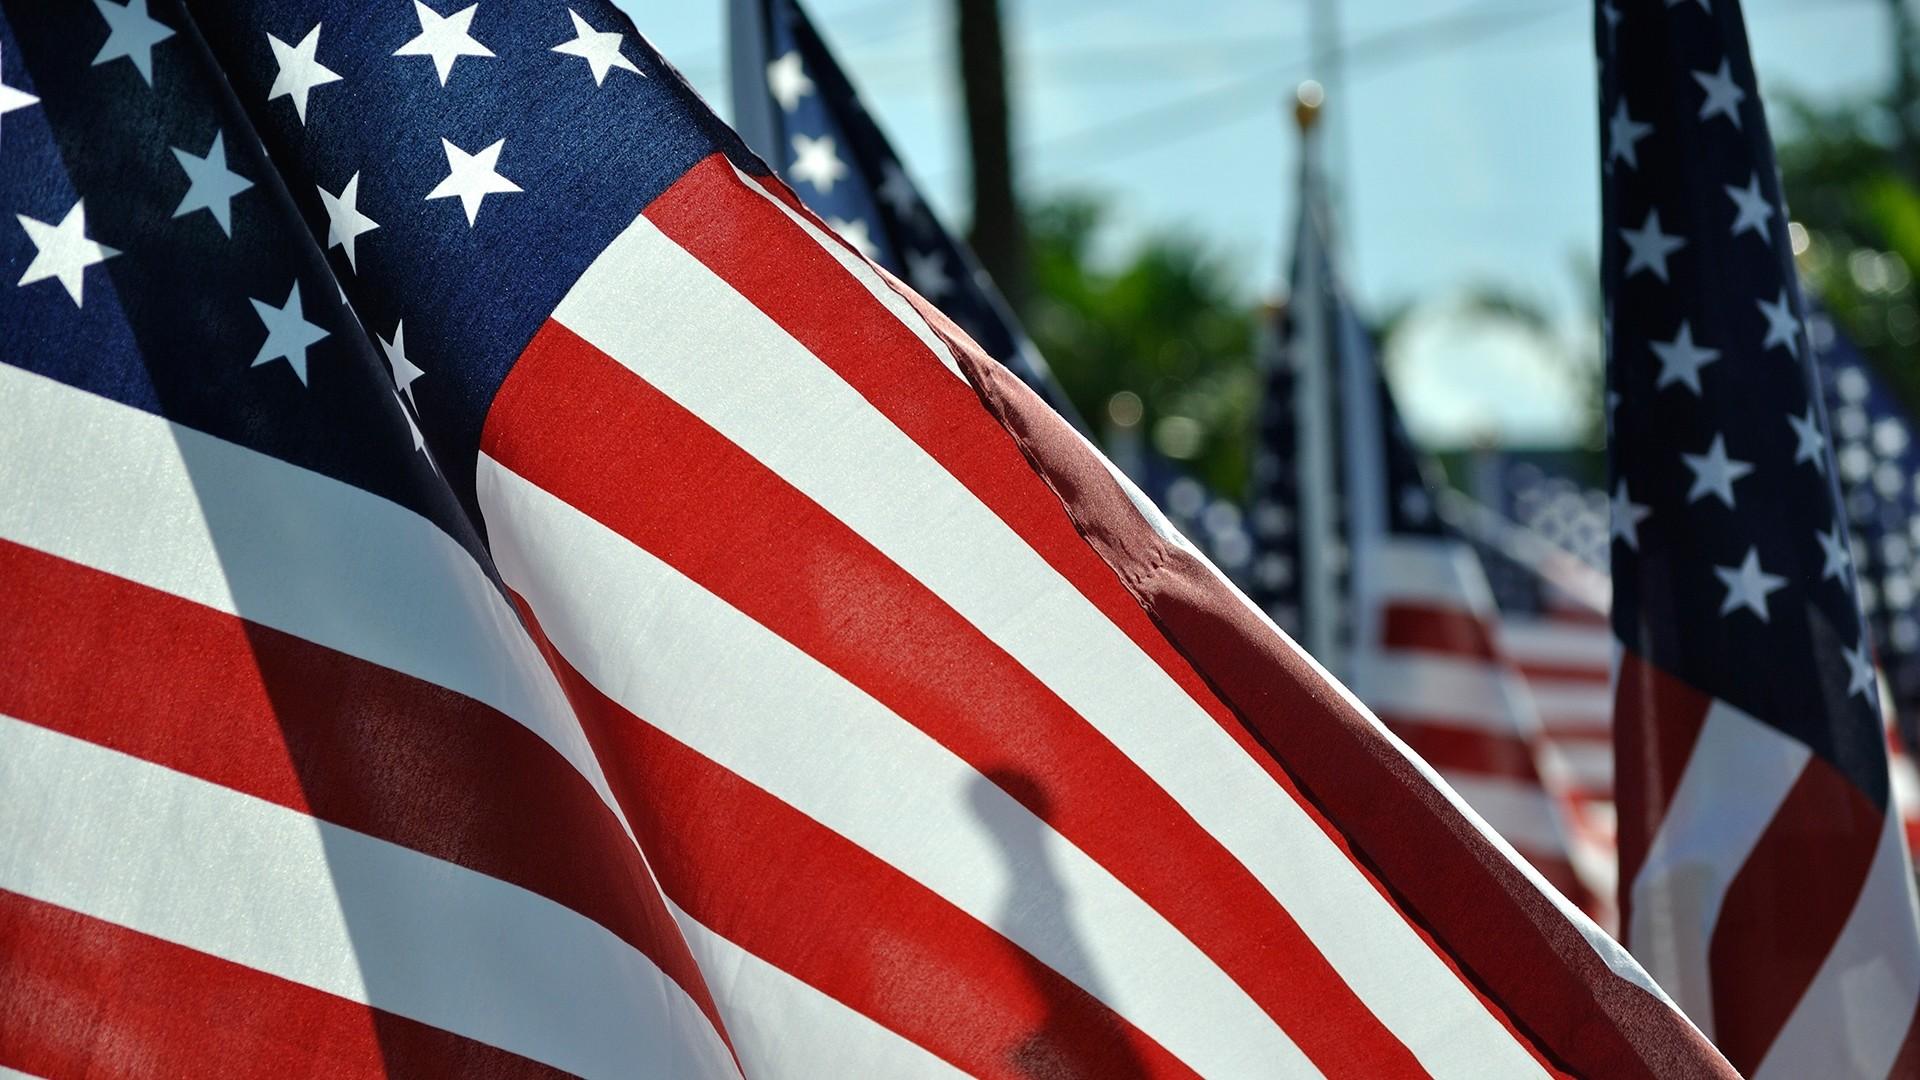 Veterans Day Background Wallpaper